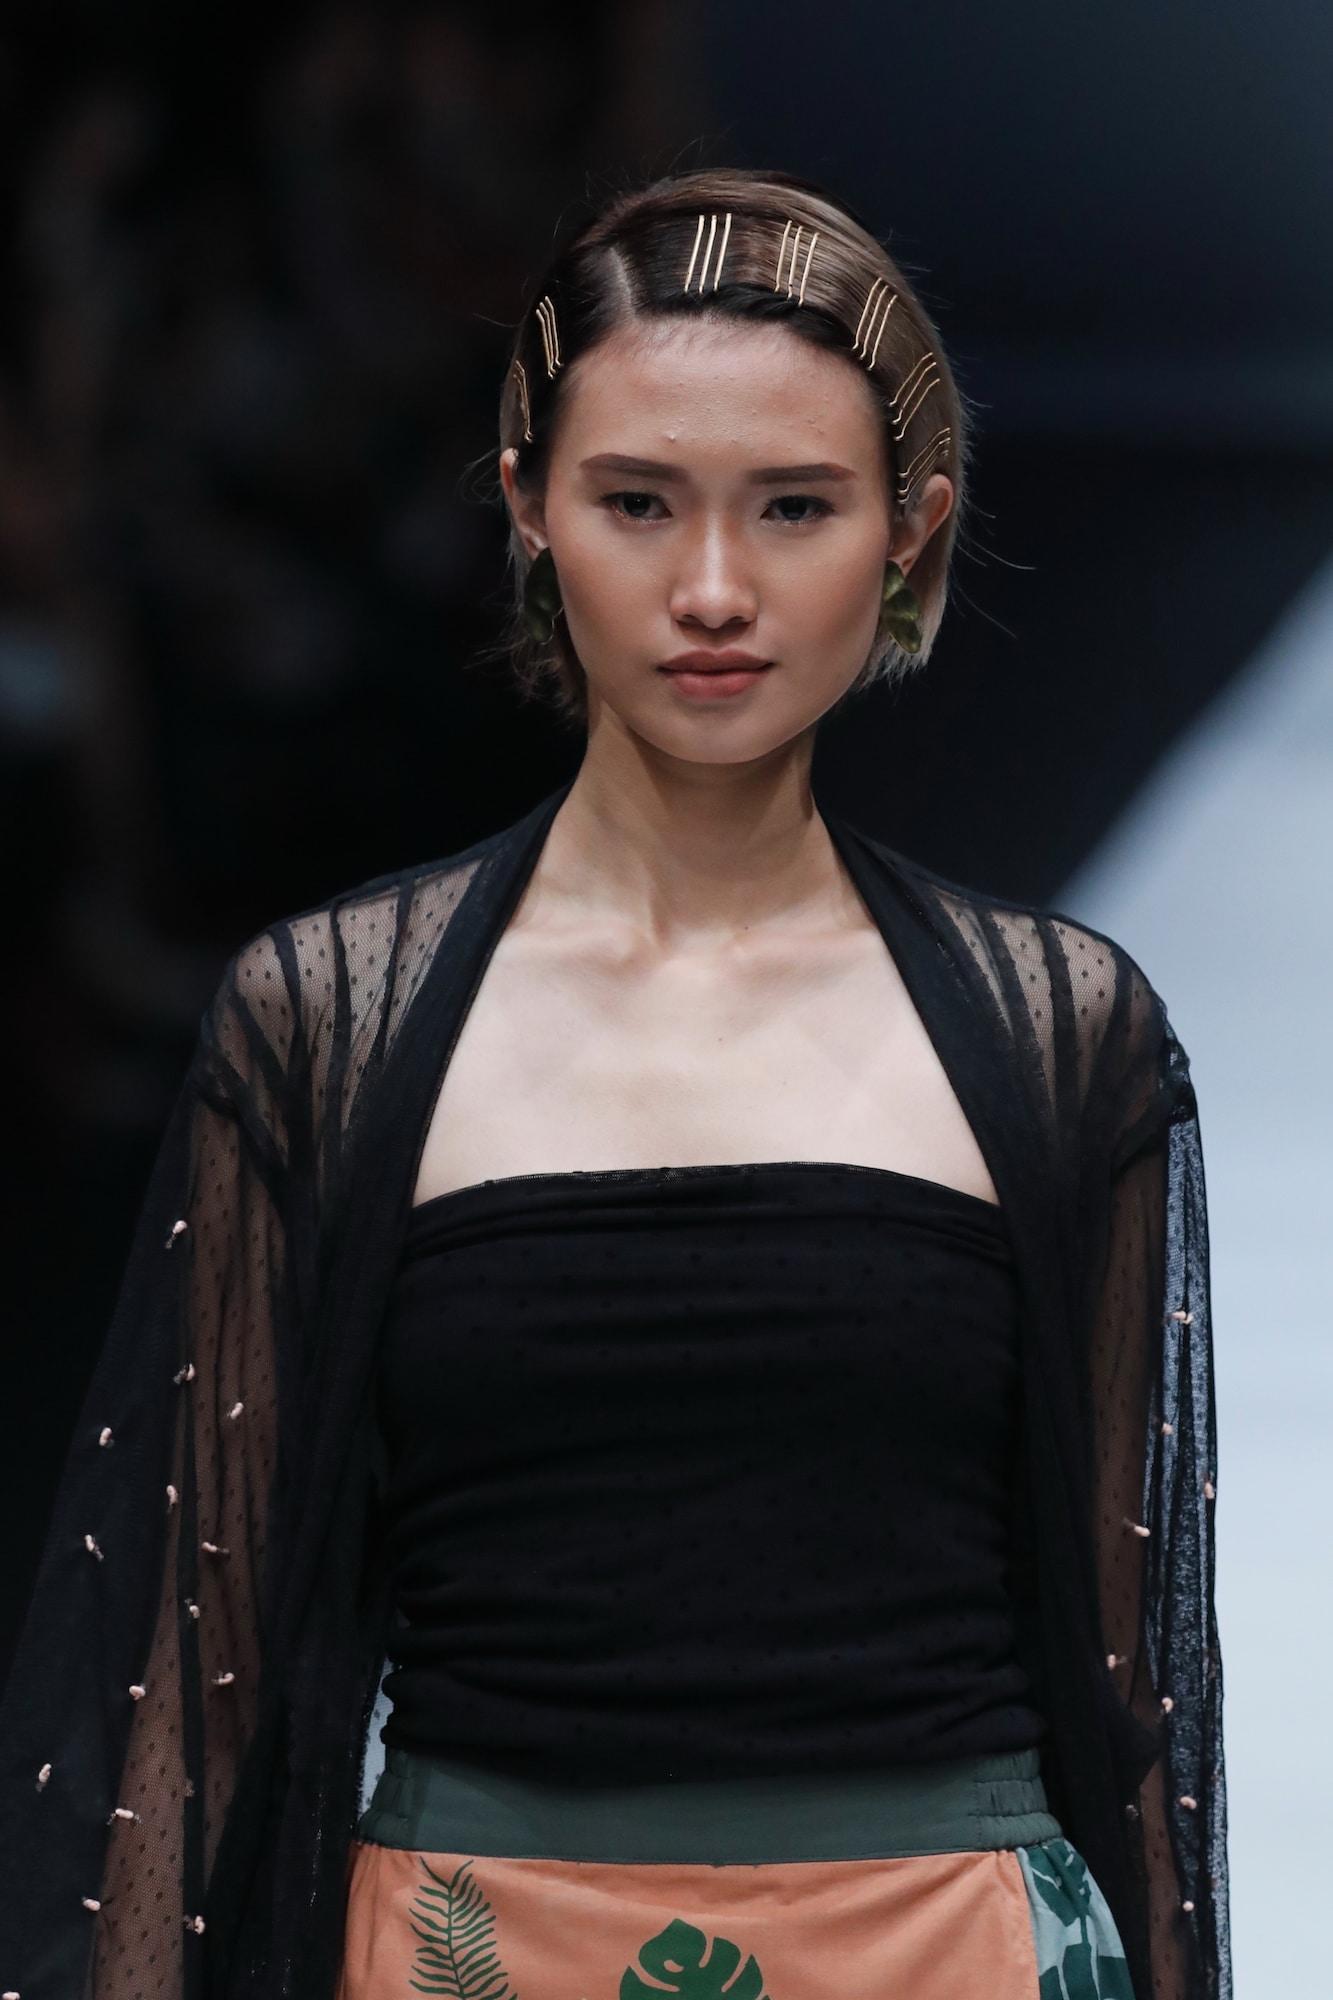 Trend model rambut runway gaya bob dengan aksesoris jepit jfw 2018 new fashon force award